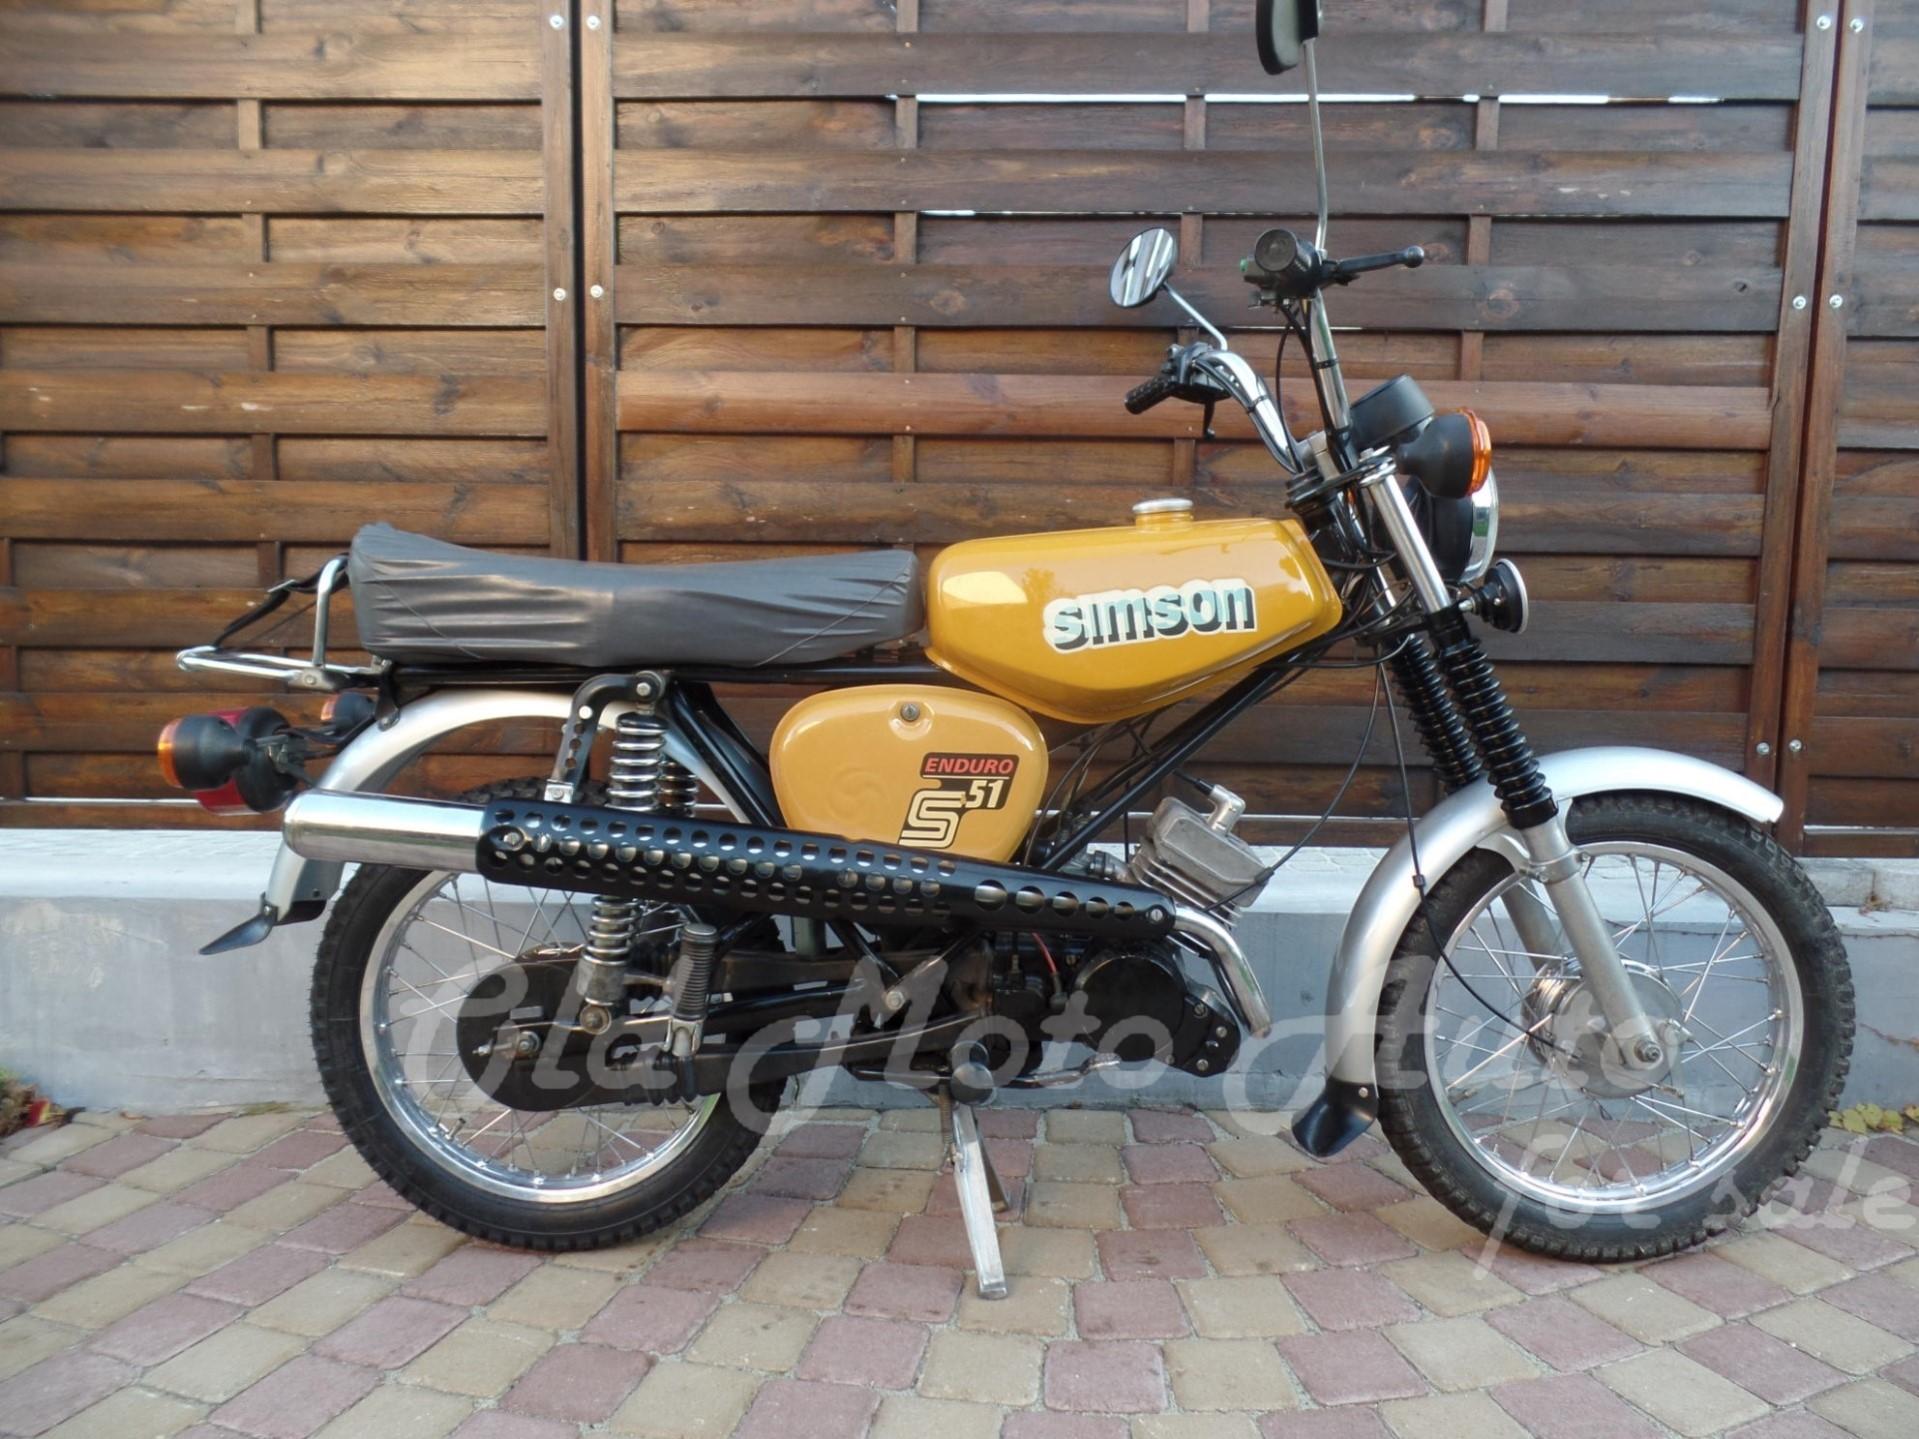 Simson Enduro S51E